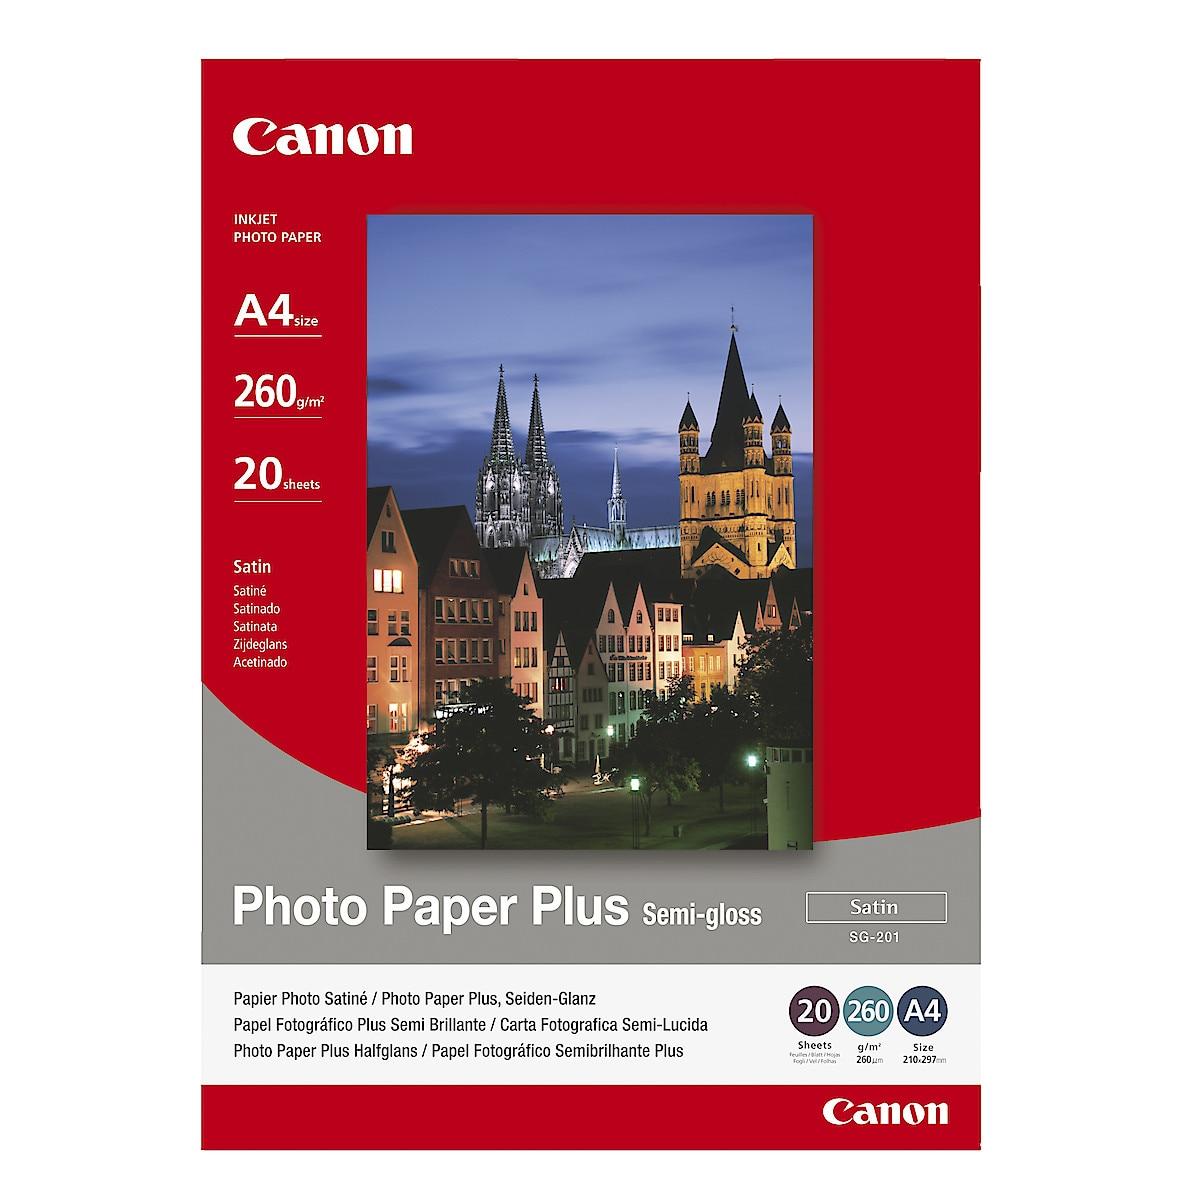 Canon Photo Paper Plus Semi-glossy SG-201, A4 blekkskriverpapir